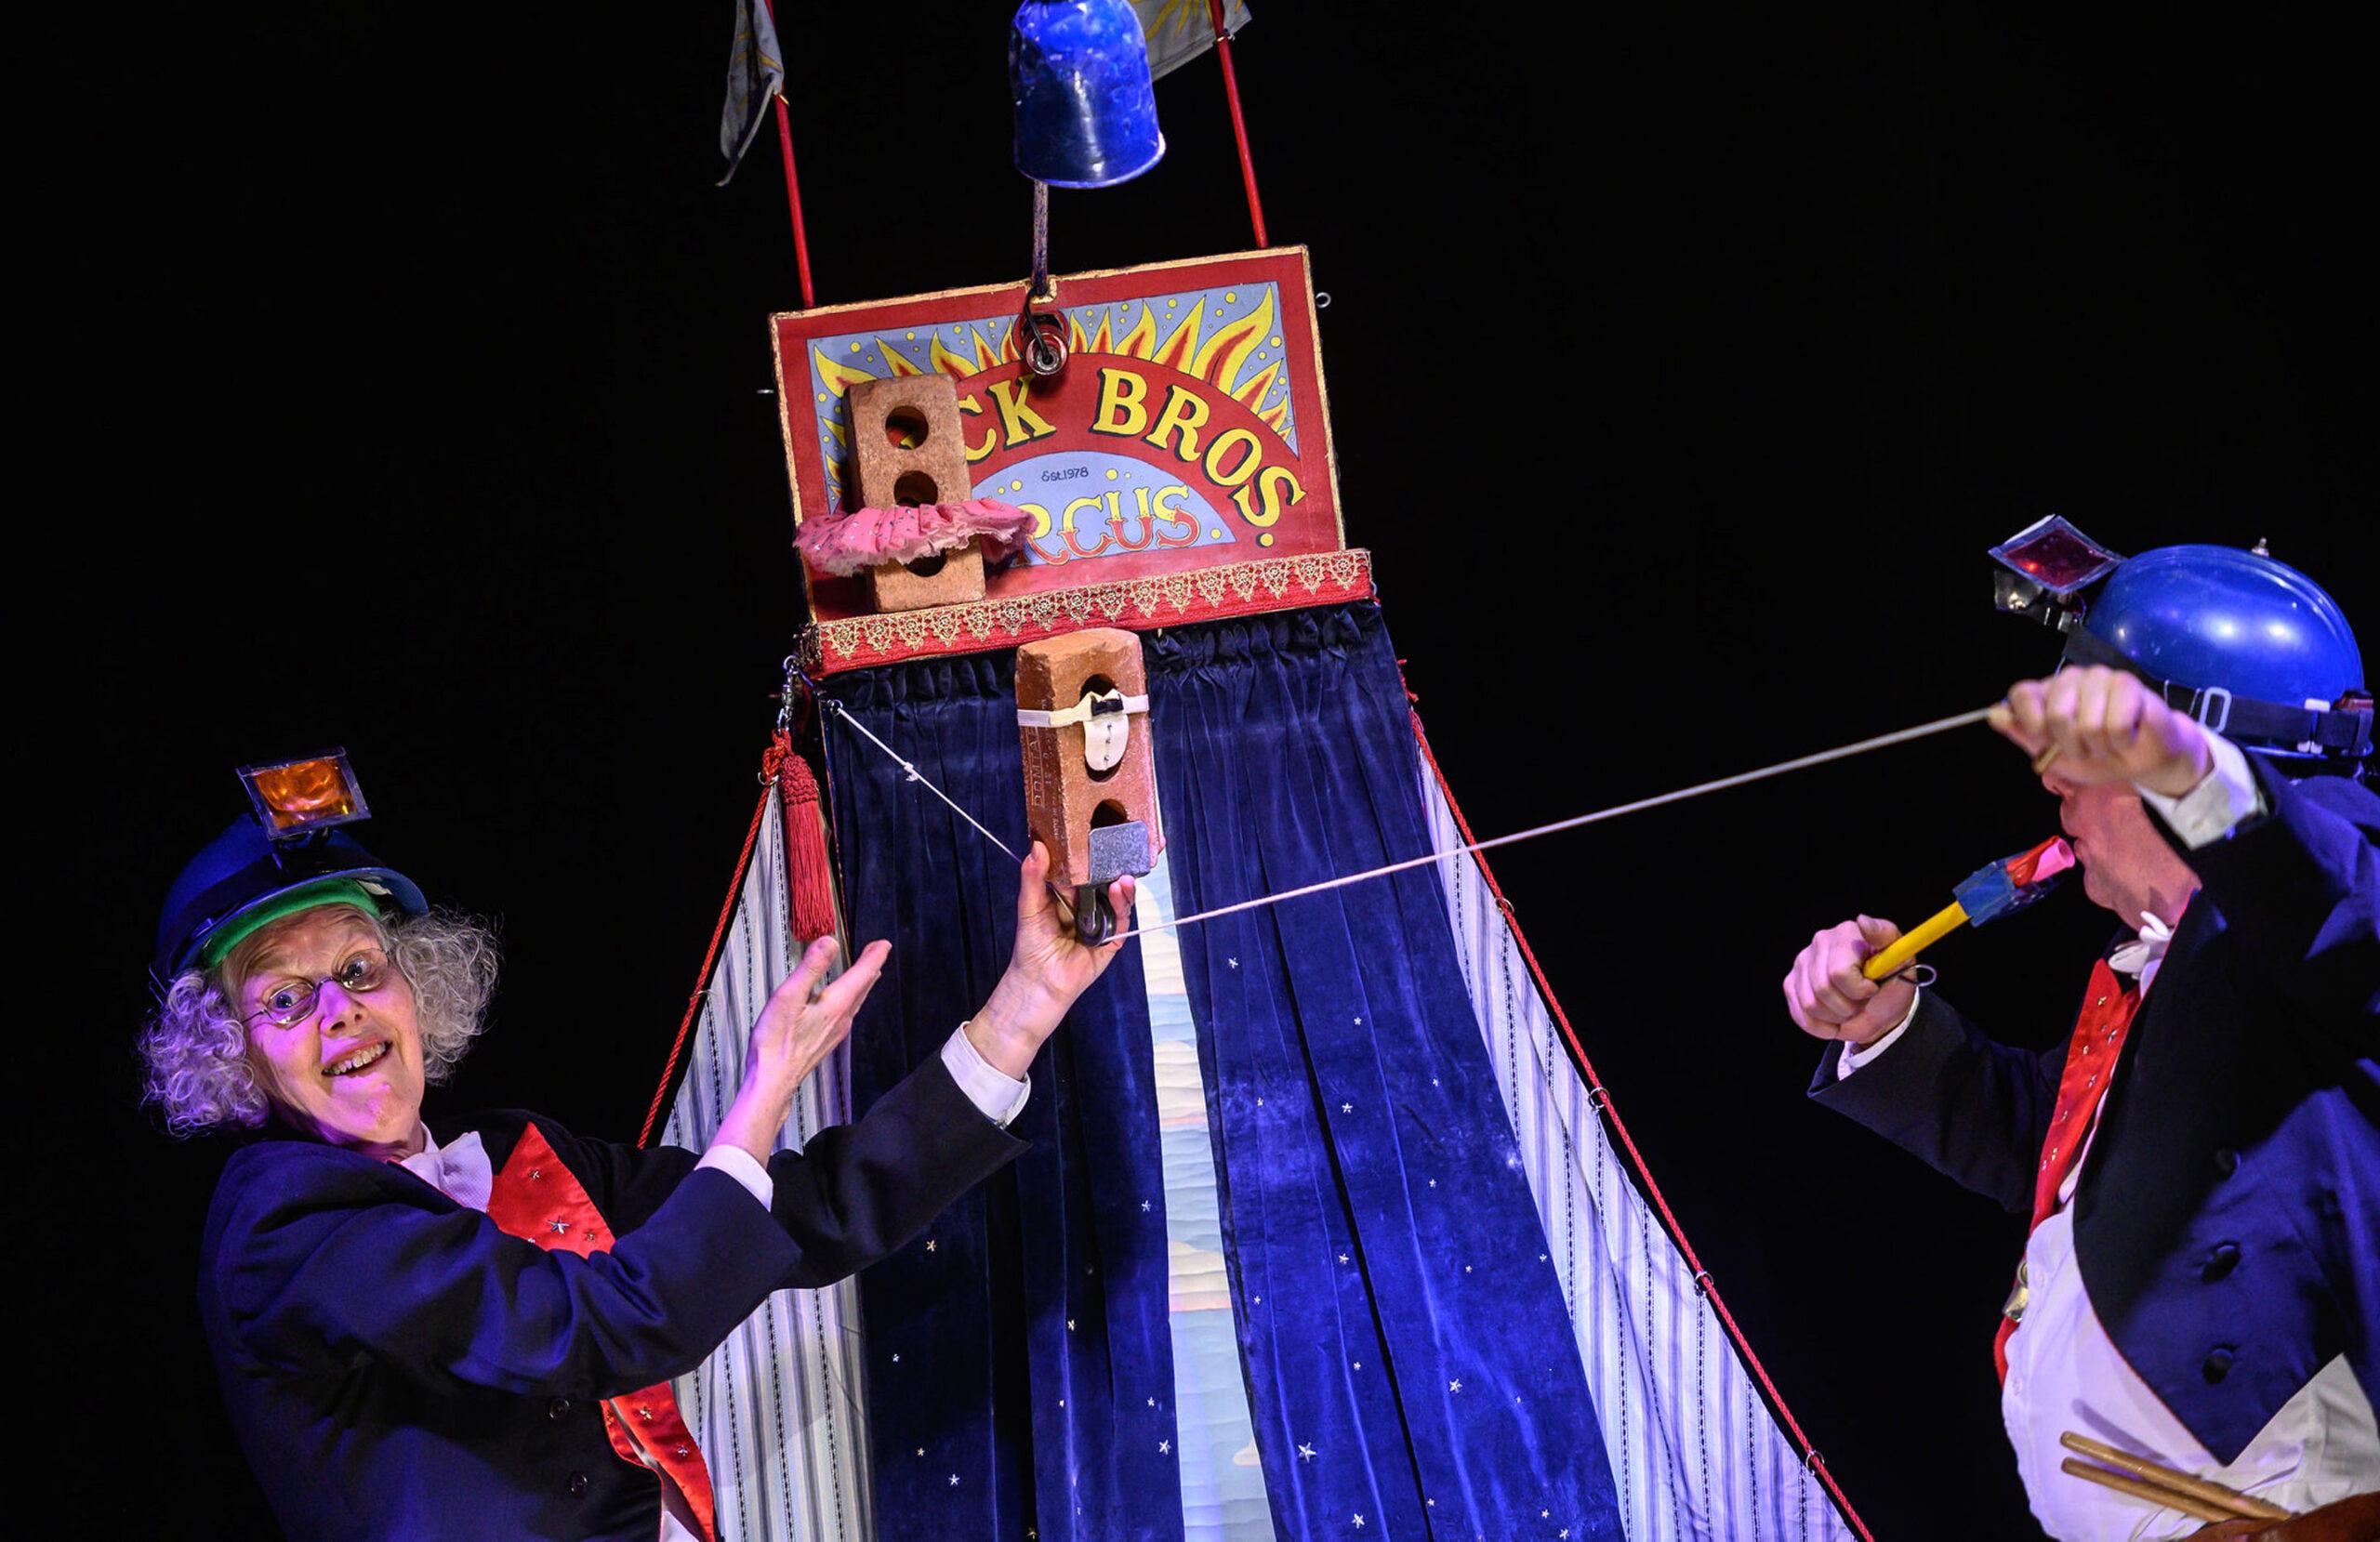 Puppetmongers' Brick Bros Circus